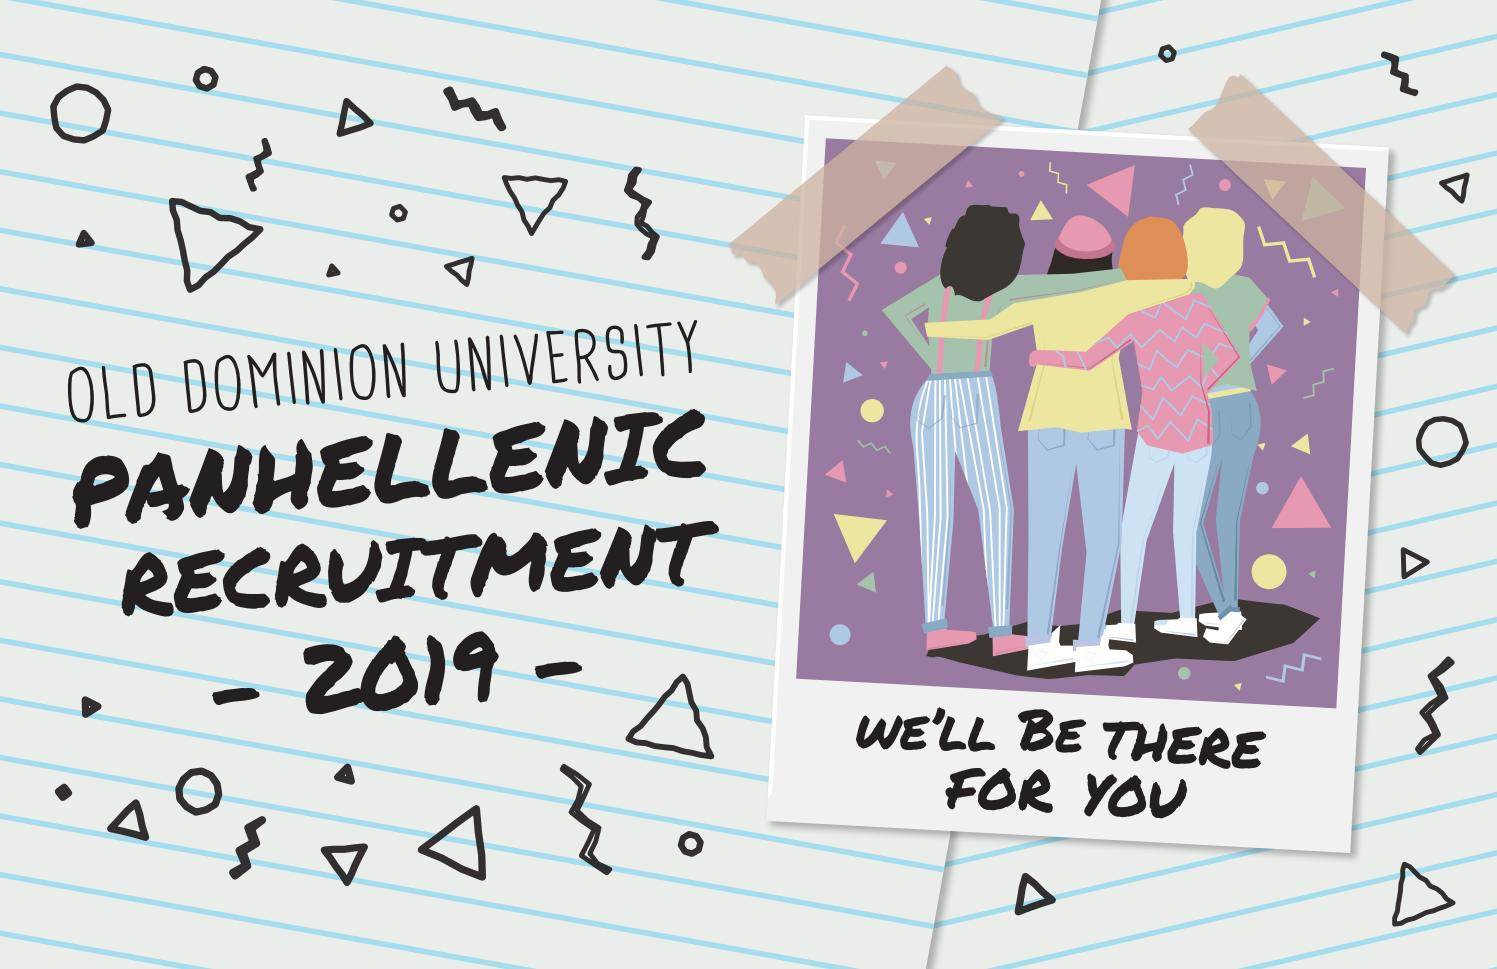 odu panhellenic sorority recruitment 2019 by oduphc